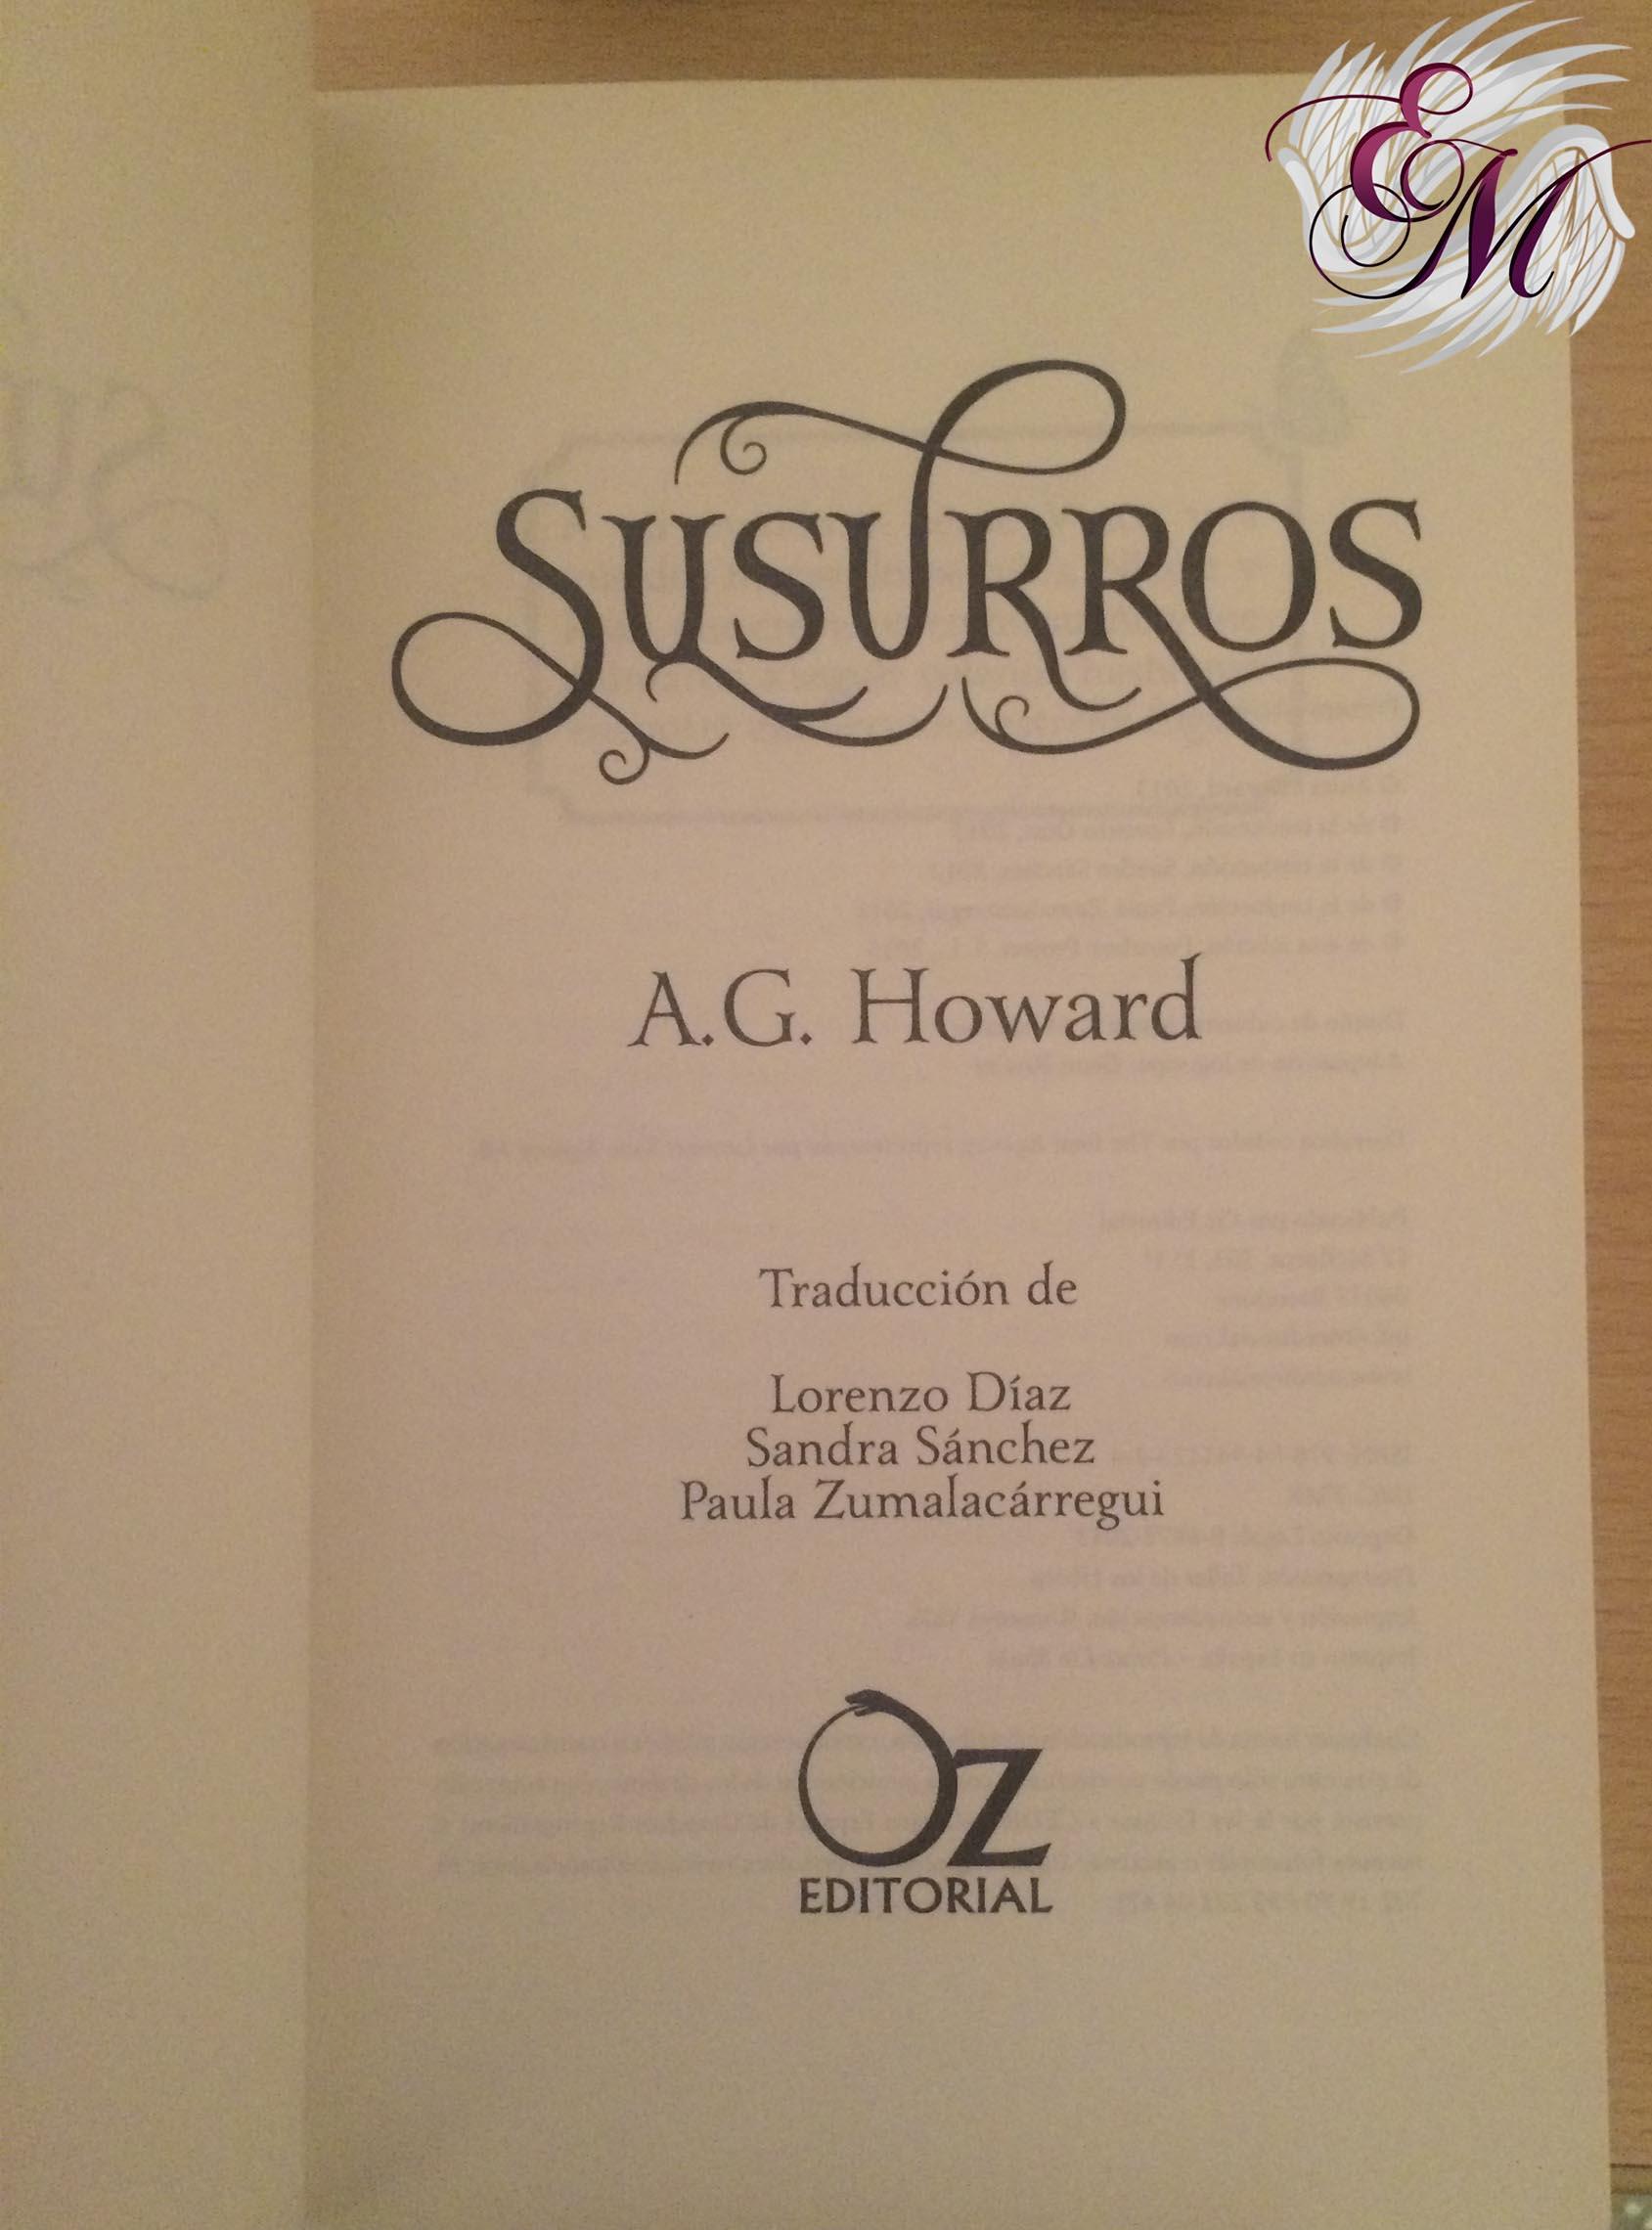 Susurros de  A.G. Howard - Reseña